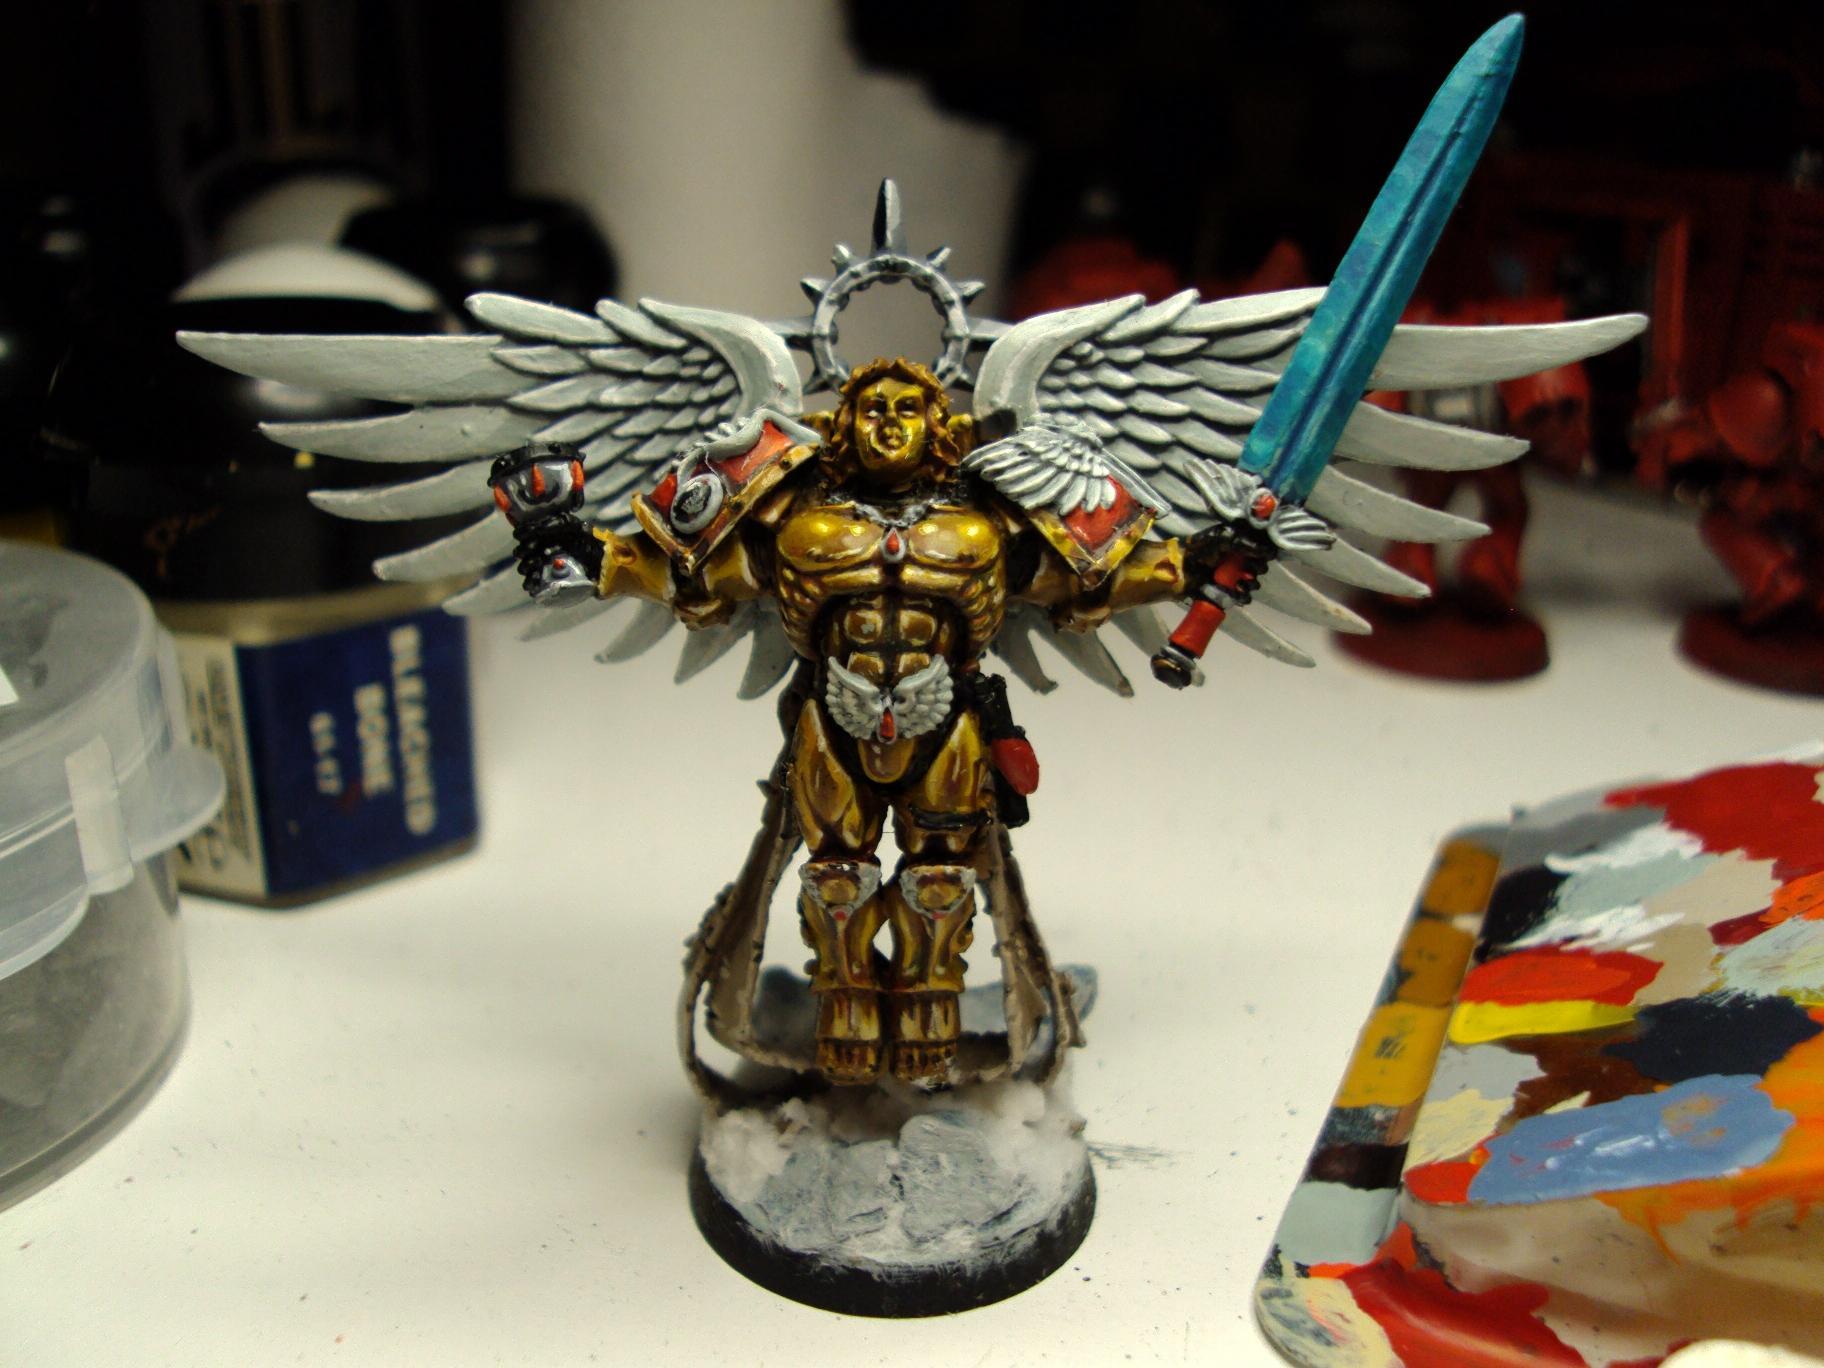 Blood Angels, Gold, Non-Metallic Metal, Sanguinor, Space Marines, Warhammer 40,000